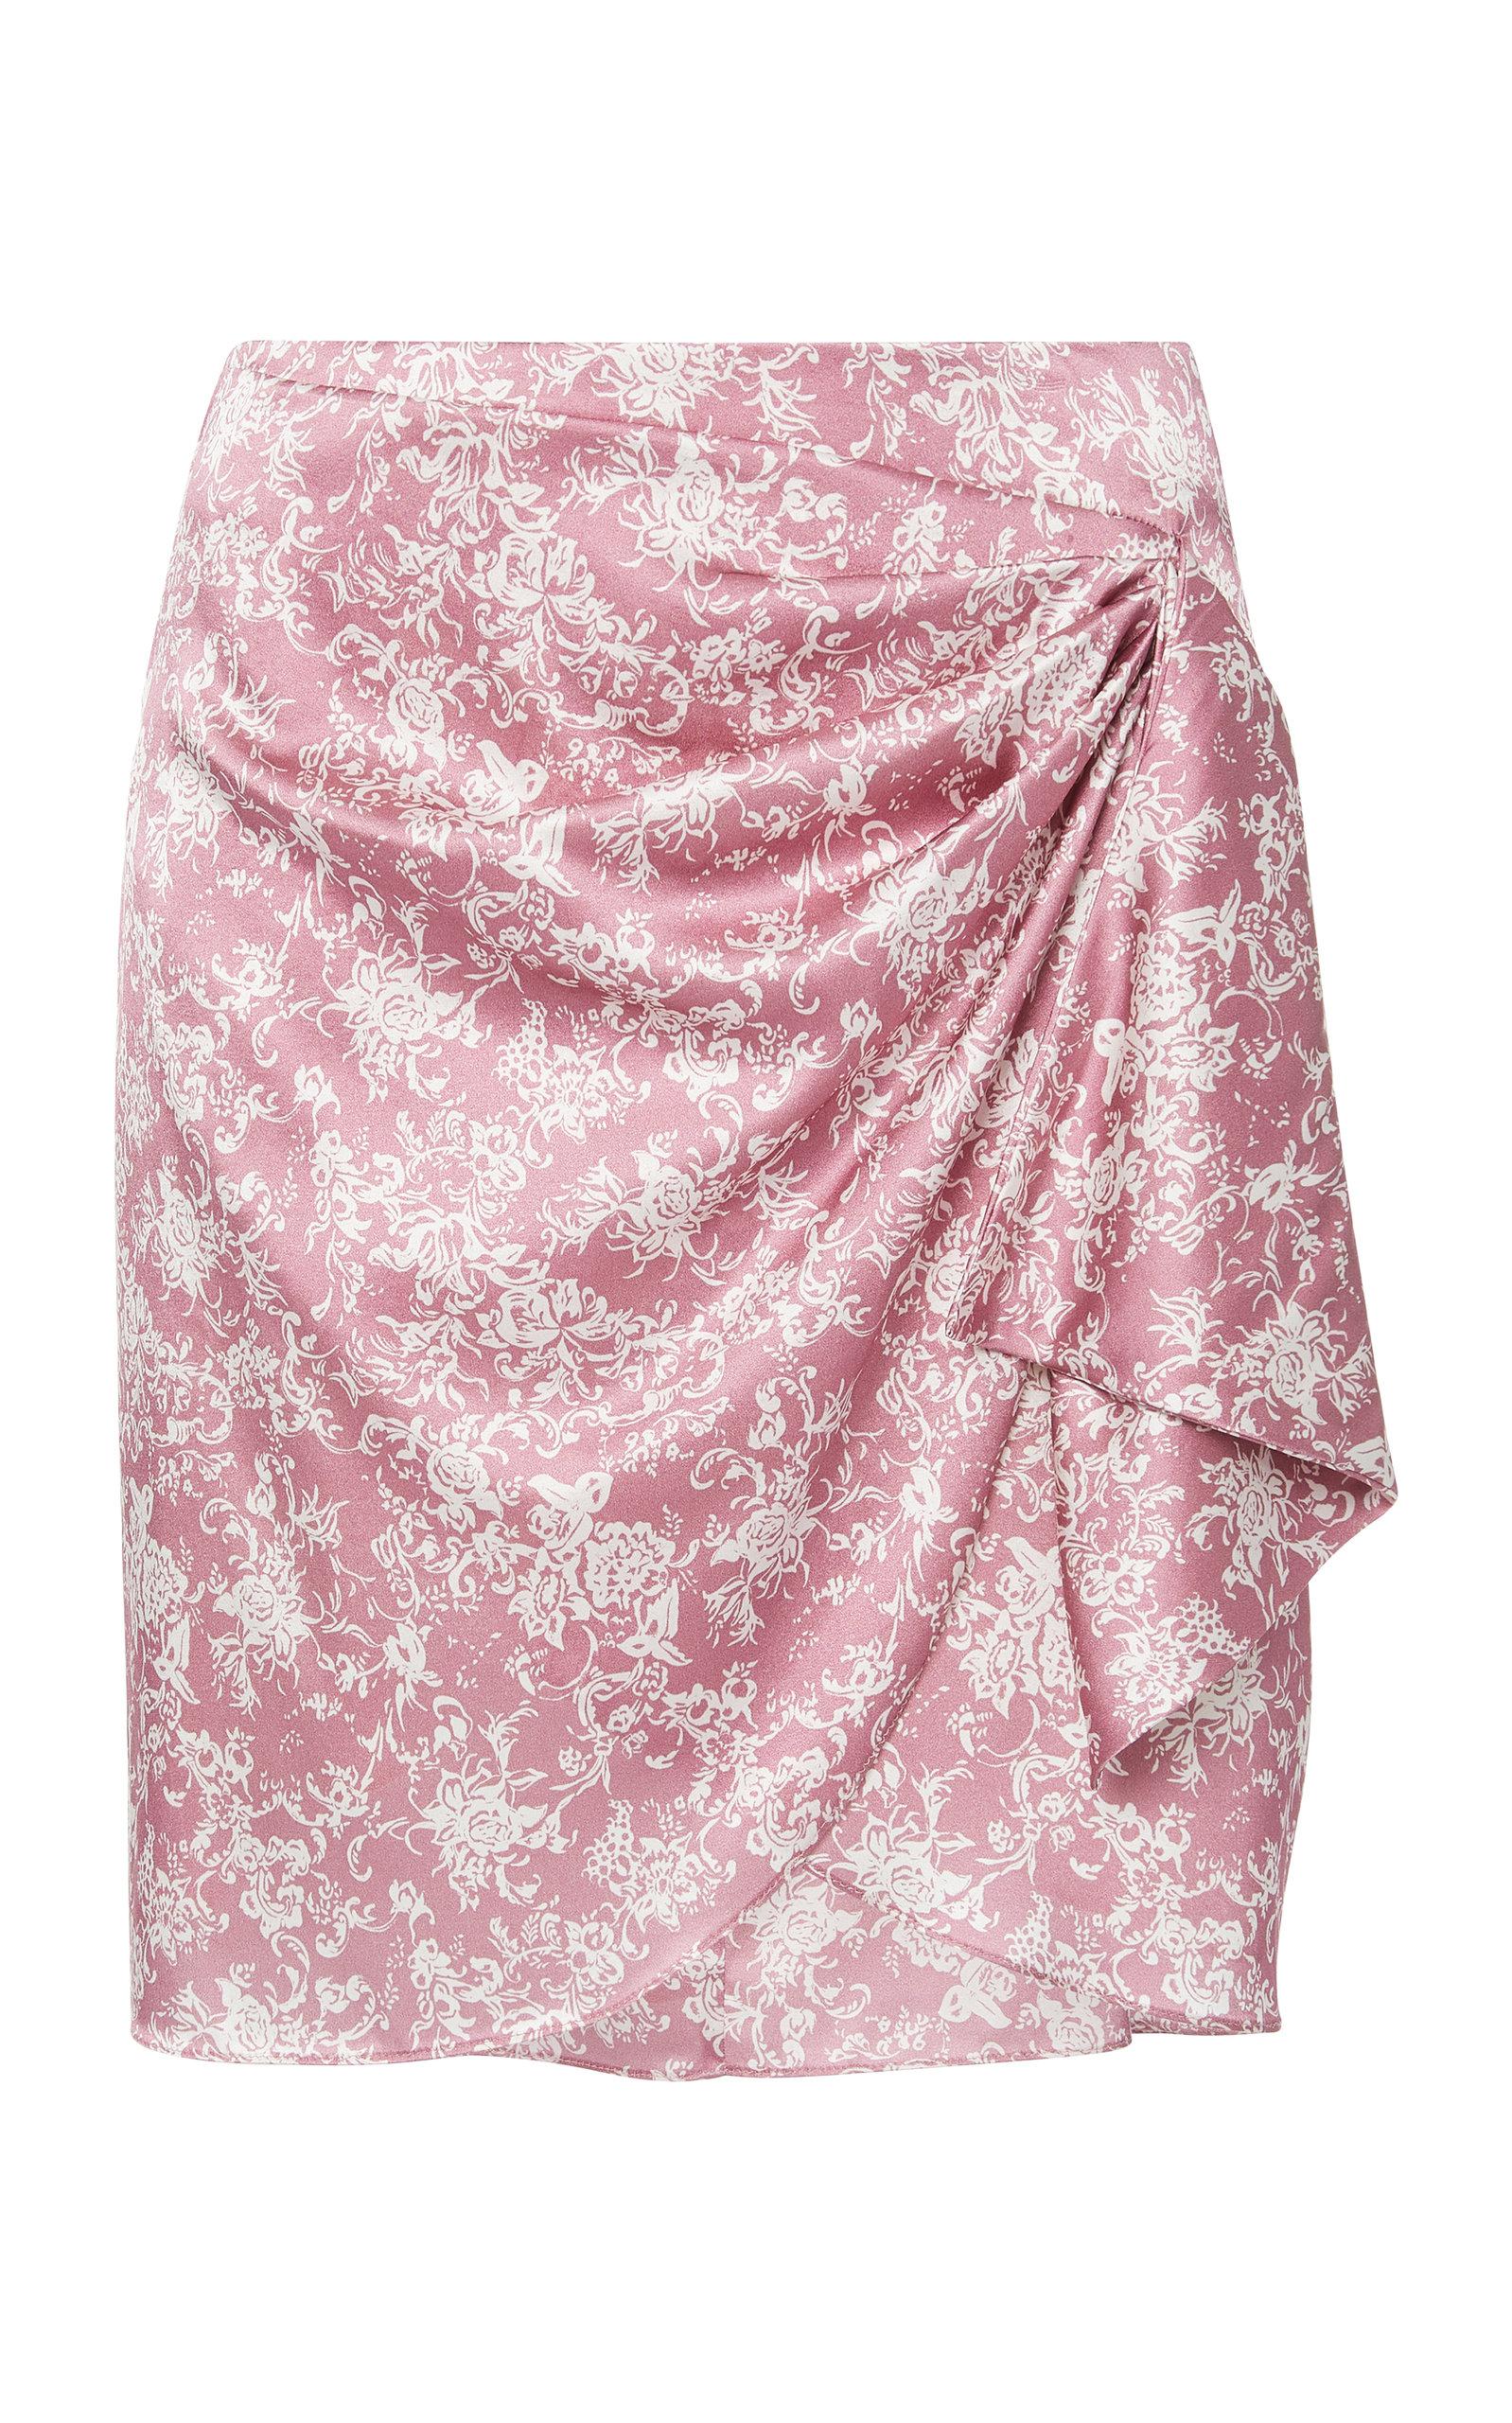 907438e86 Koren Wrap Mini Skirt by Caroline Constas   Moda Operandi